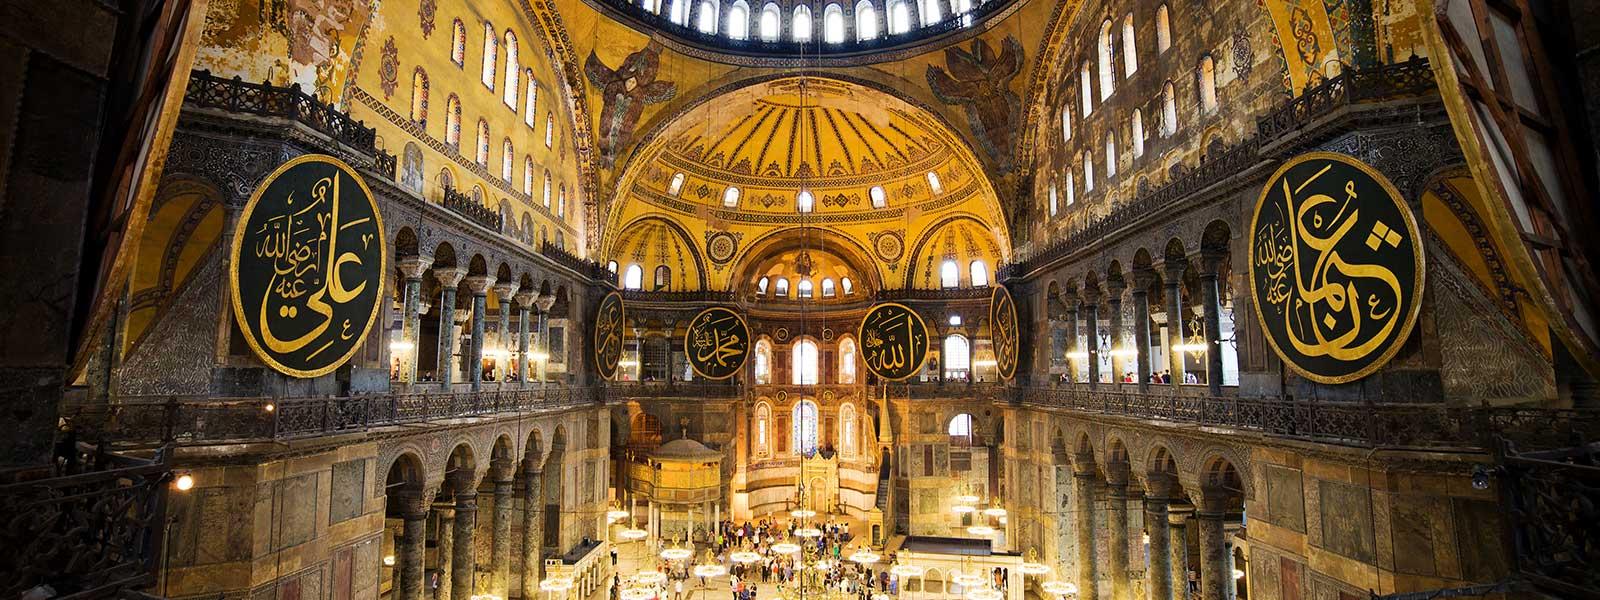 Hagia Sophia Museum, Istanbul Turkey